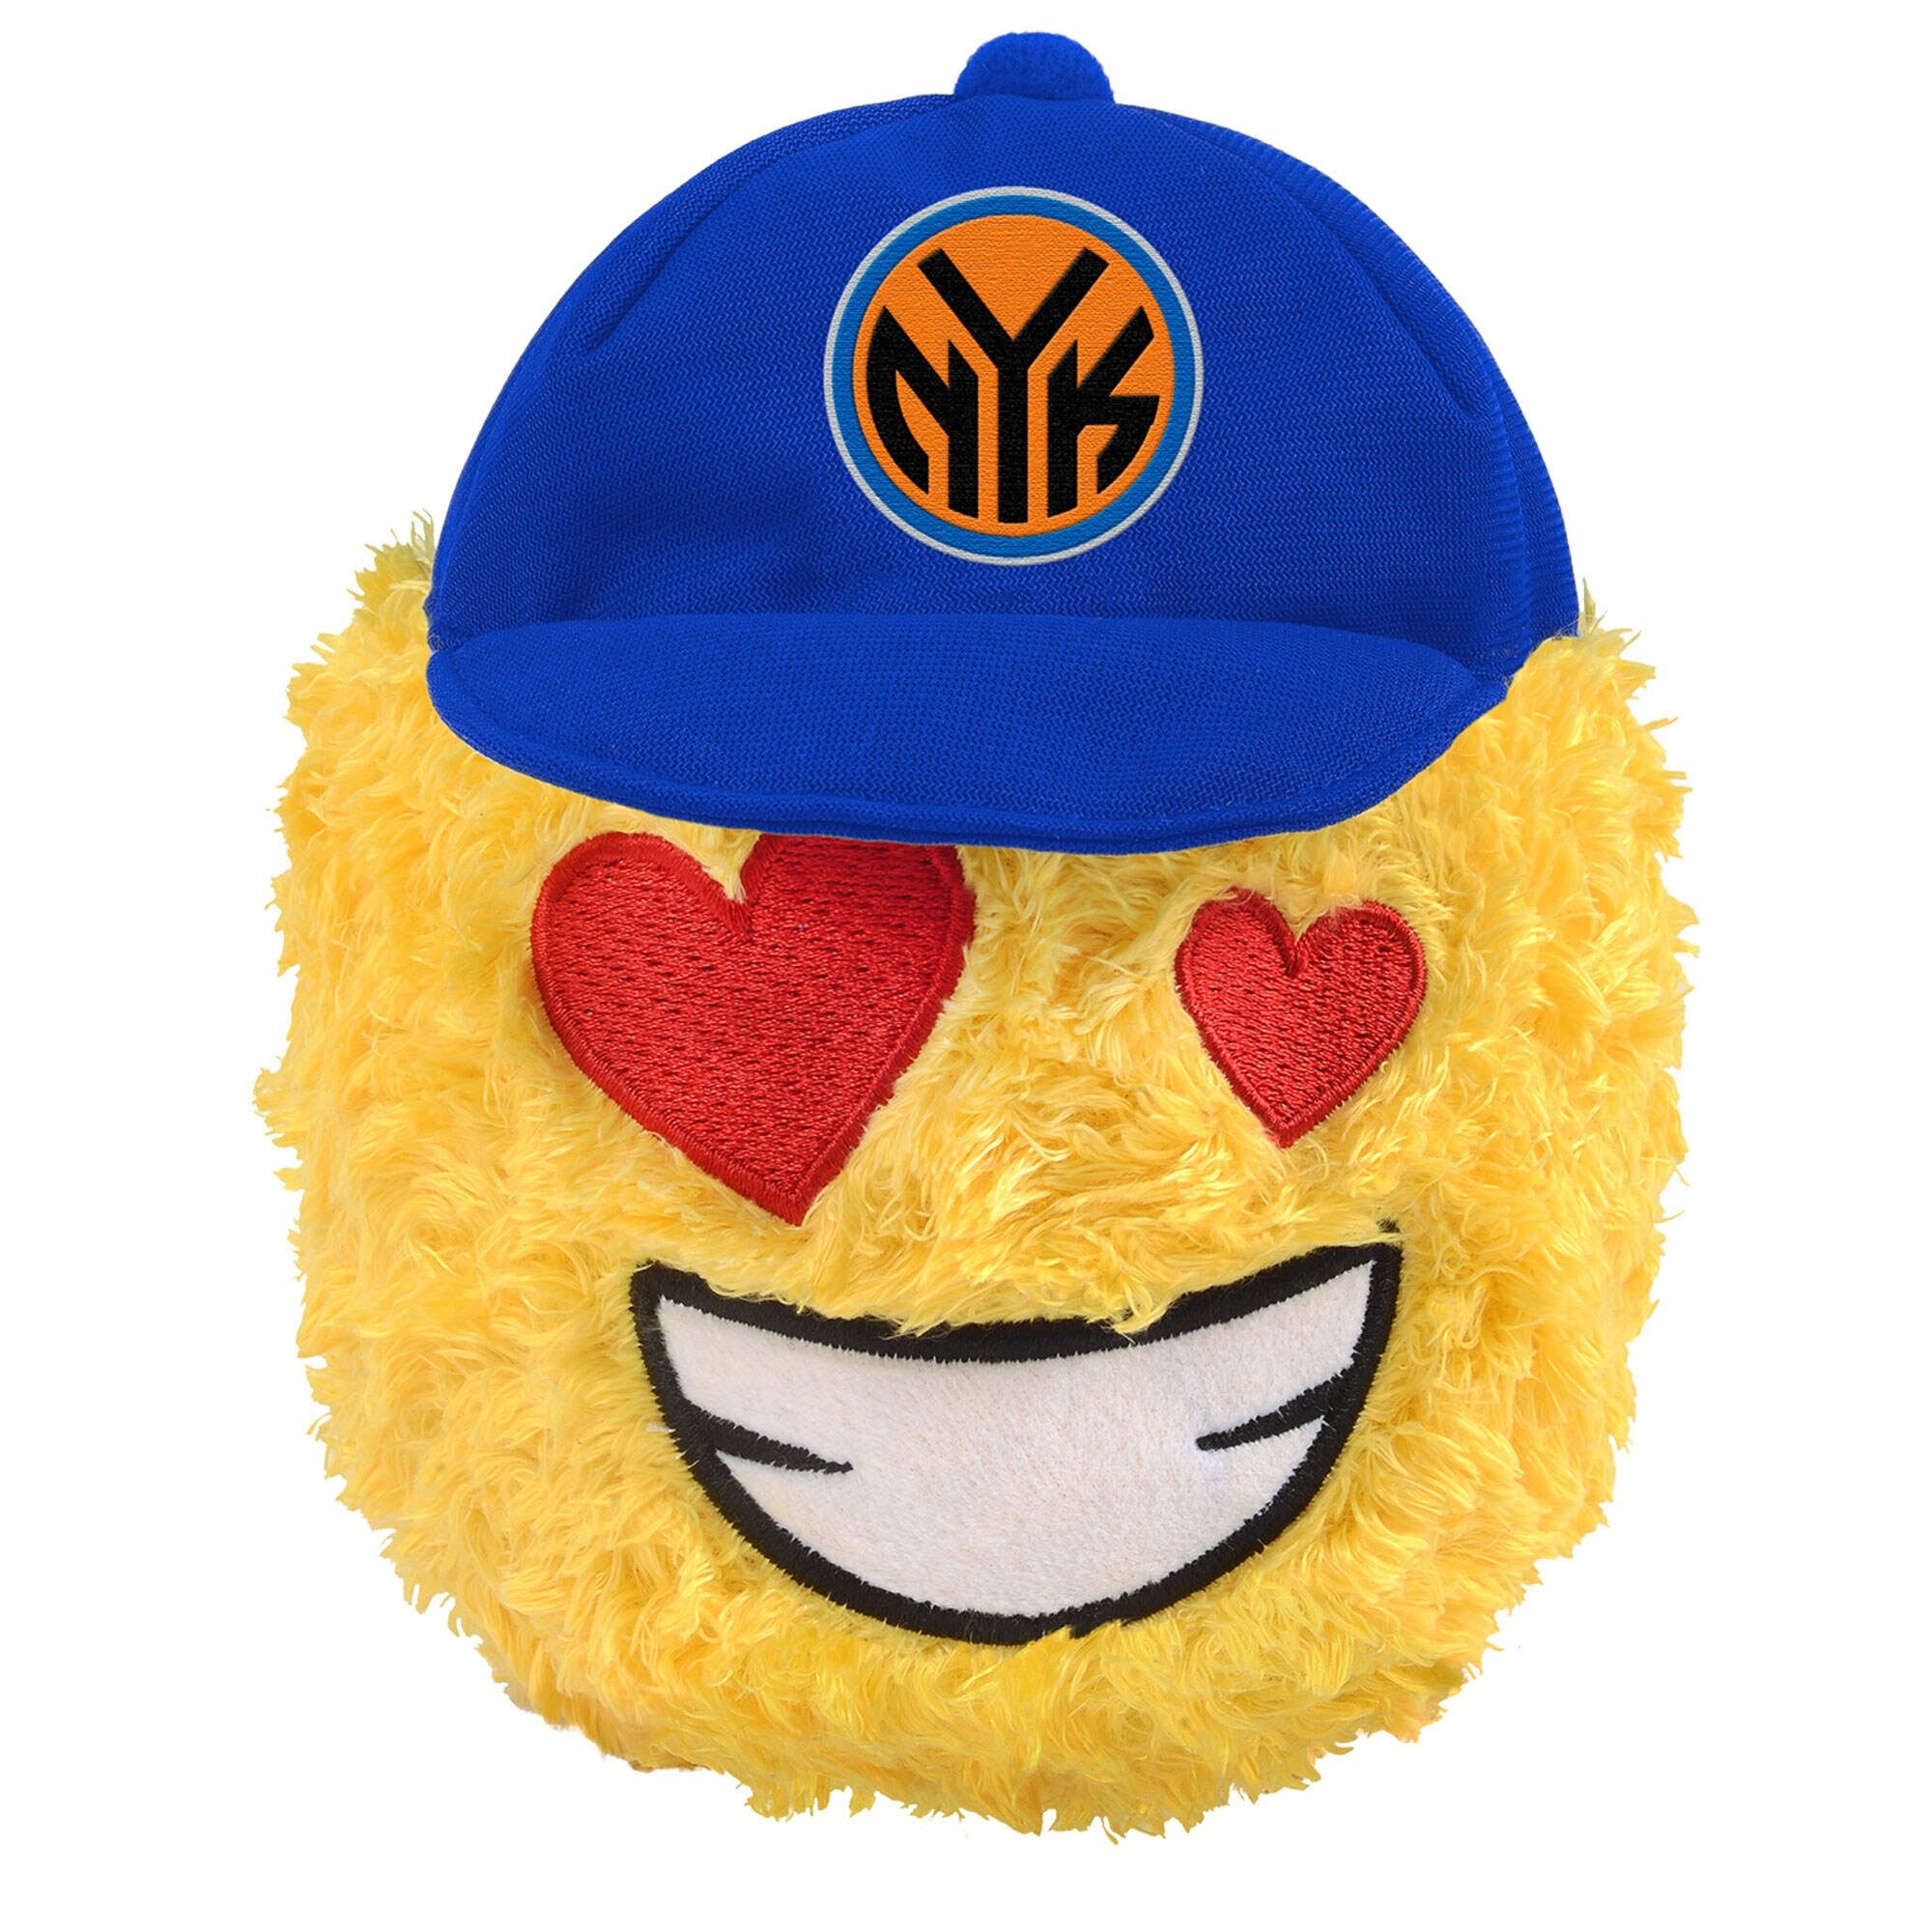 "New York Knicks 5"" Heart Eyes Teamoji Plush Toy"